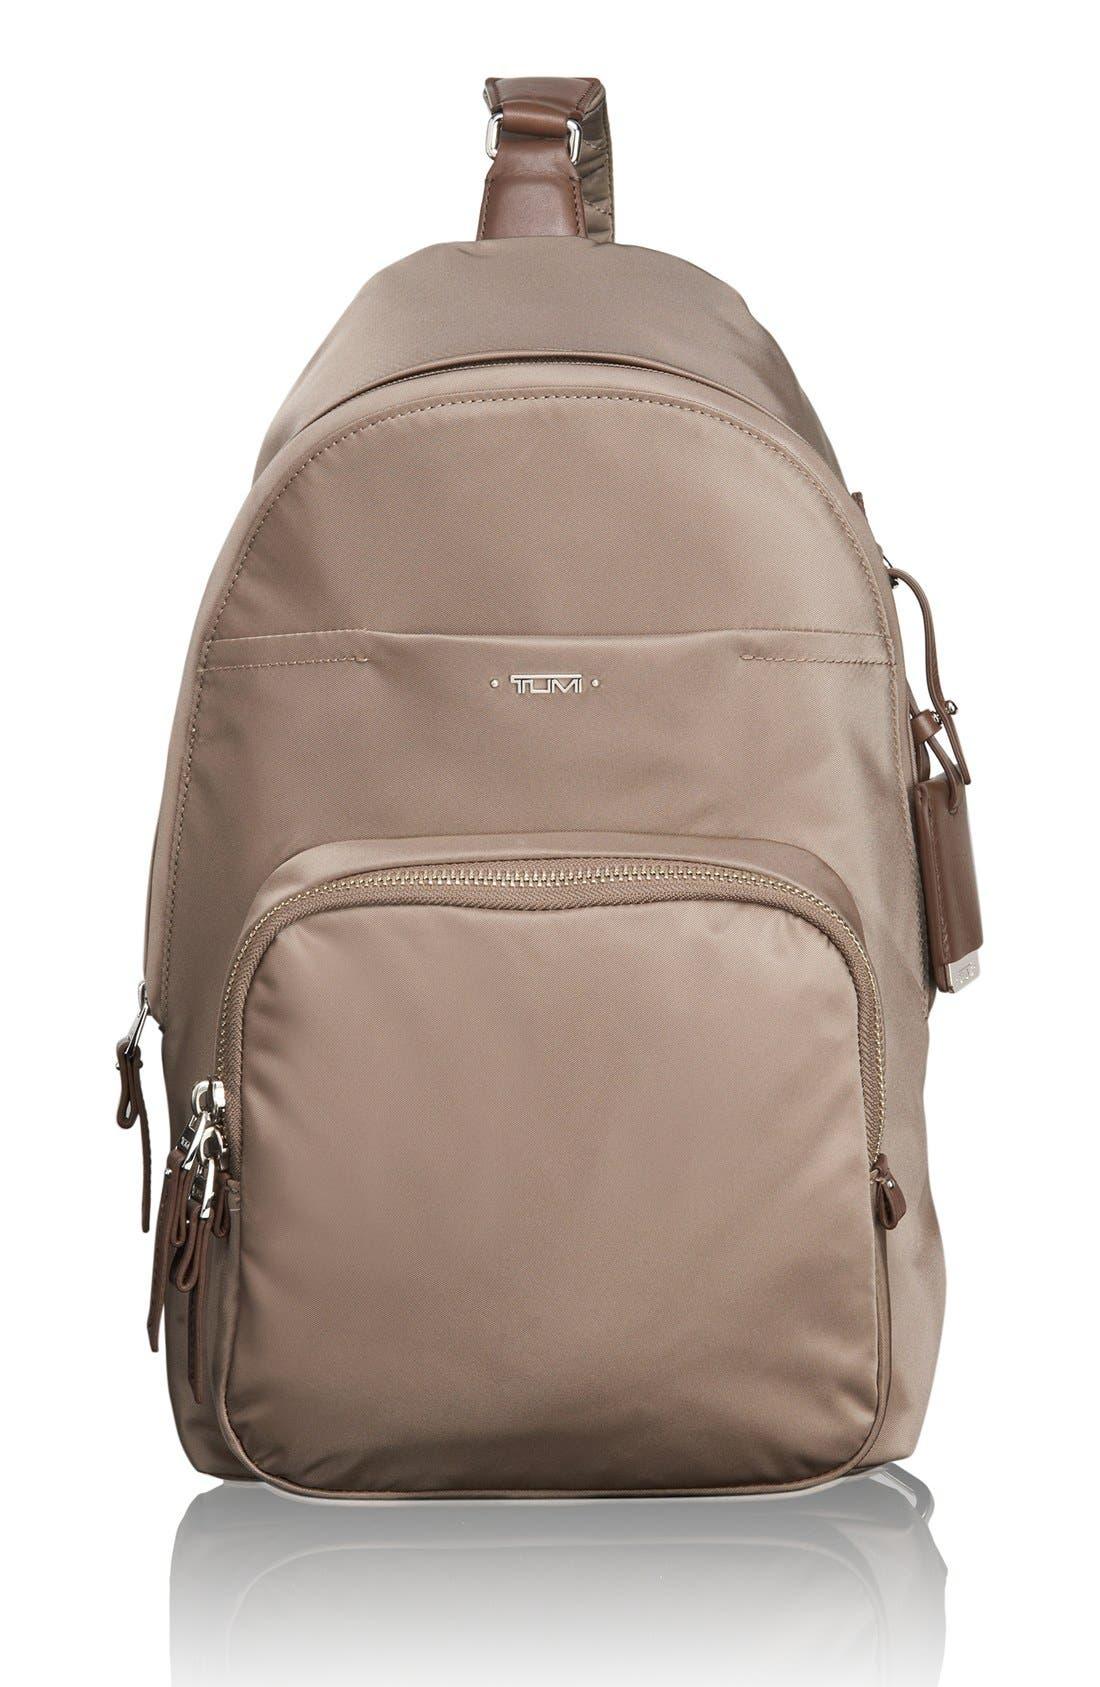 Main Image - Tumi 'Brive' Sling Backpack